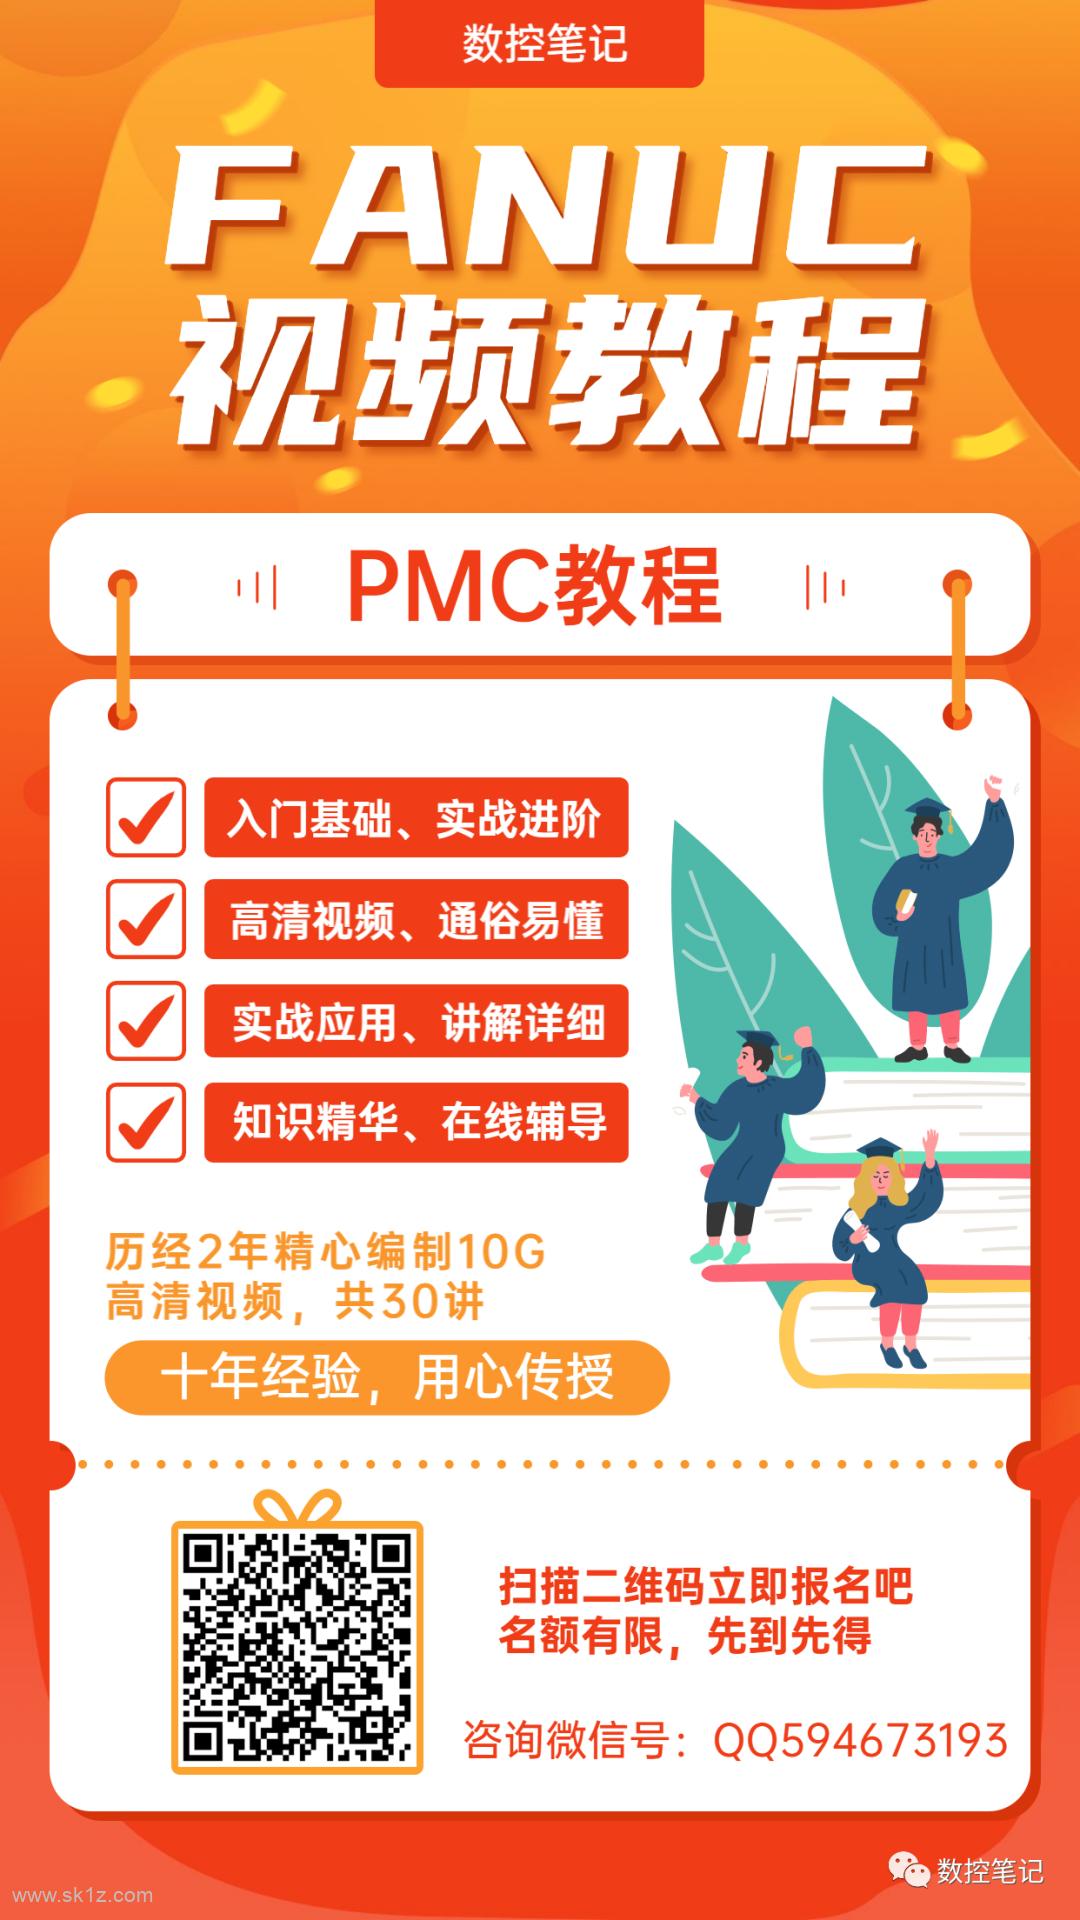 FANUC如何通过PMC实现三点找圆心?